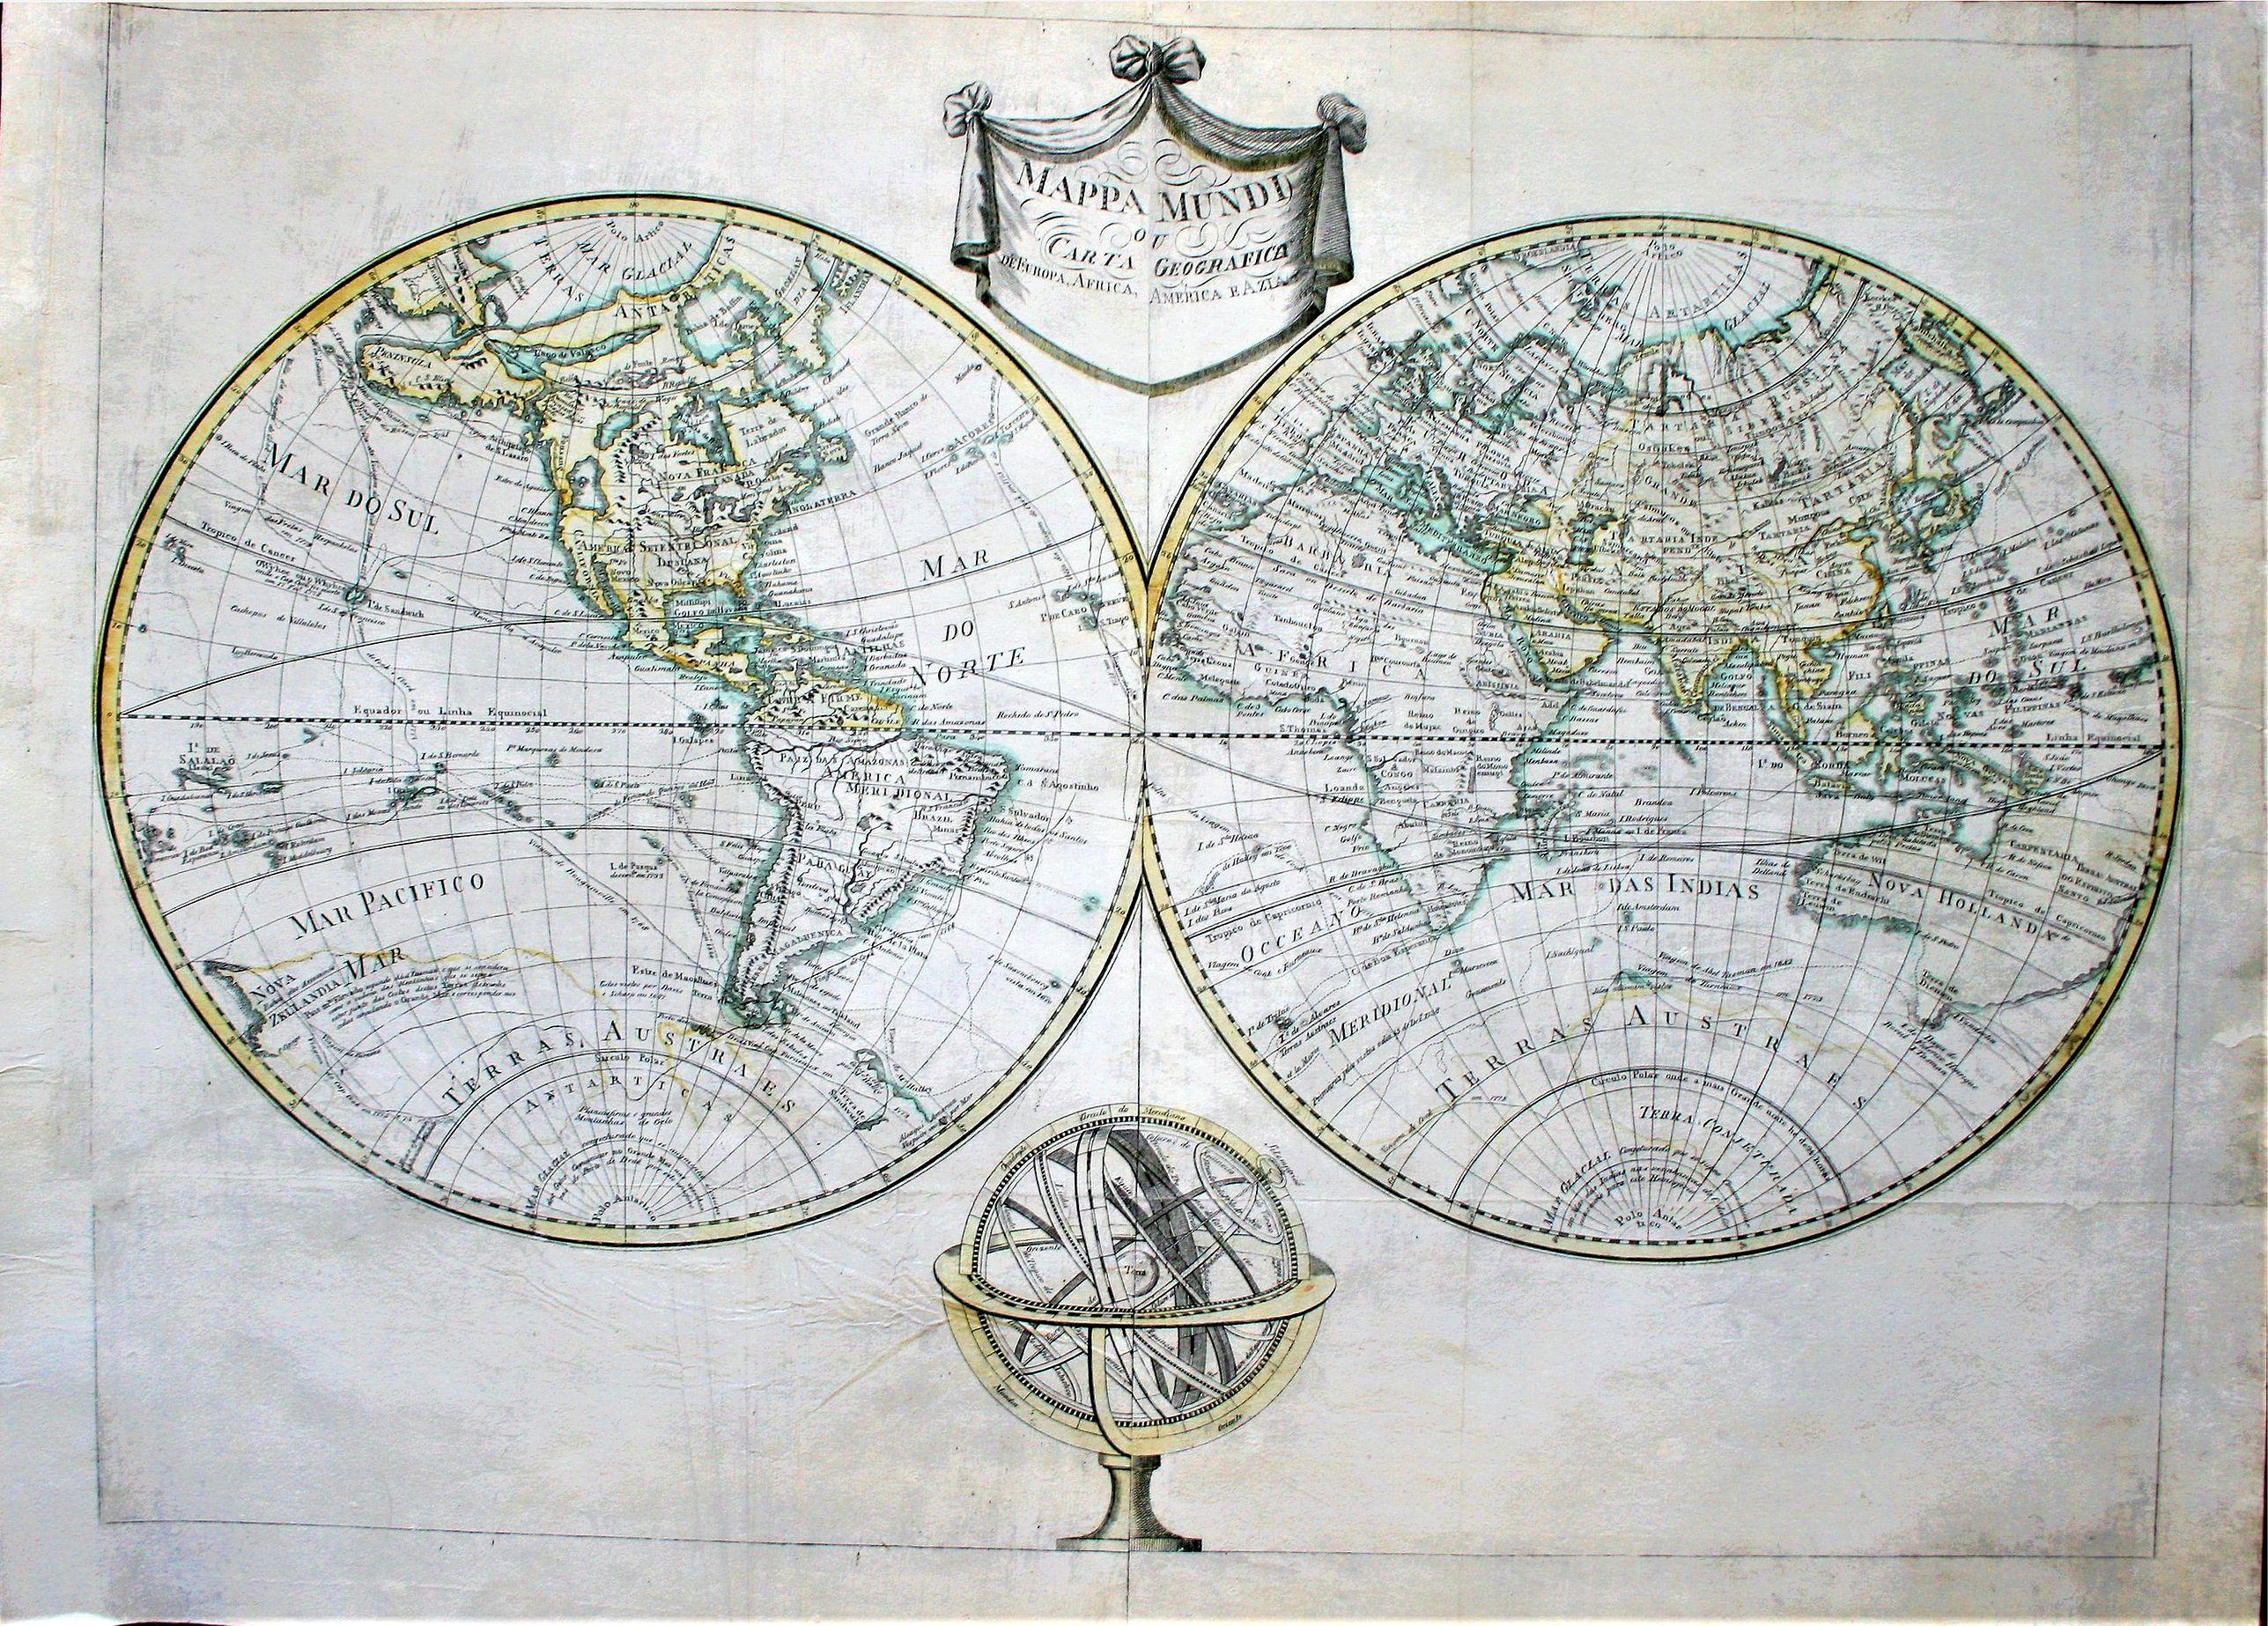 ANONYMOUS - Mappa Mundi ou carta geografica de Europa, Africa, America e Azia.